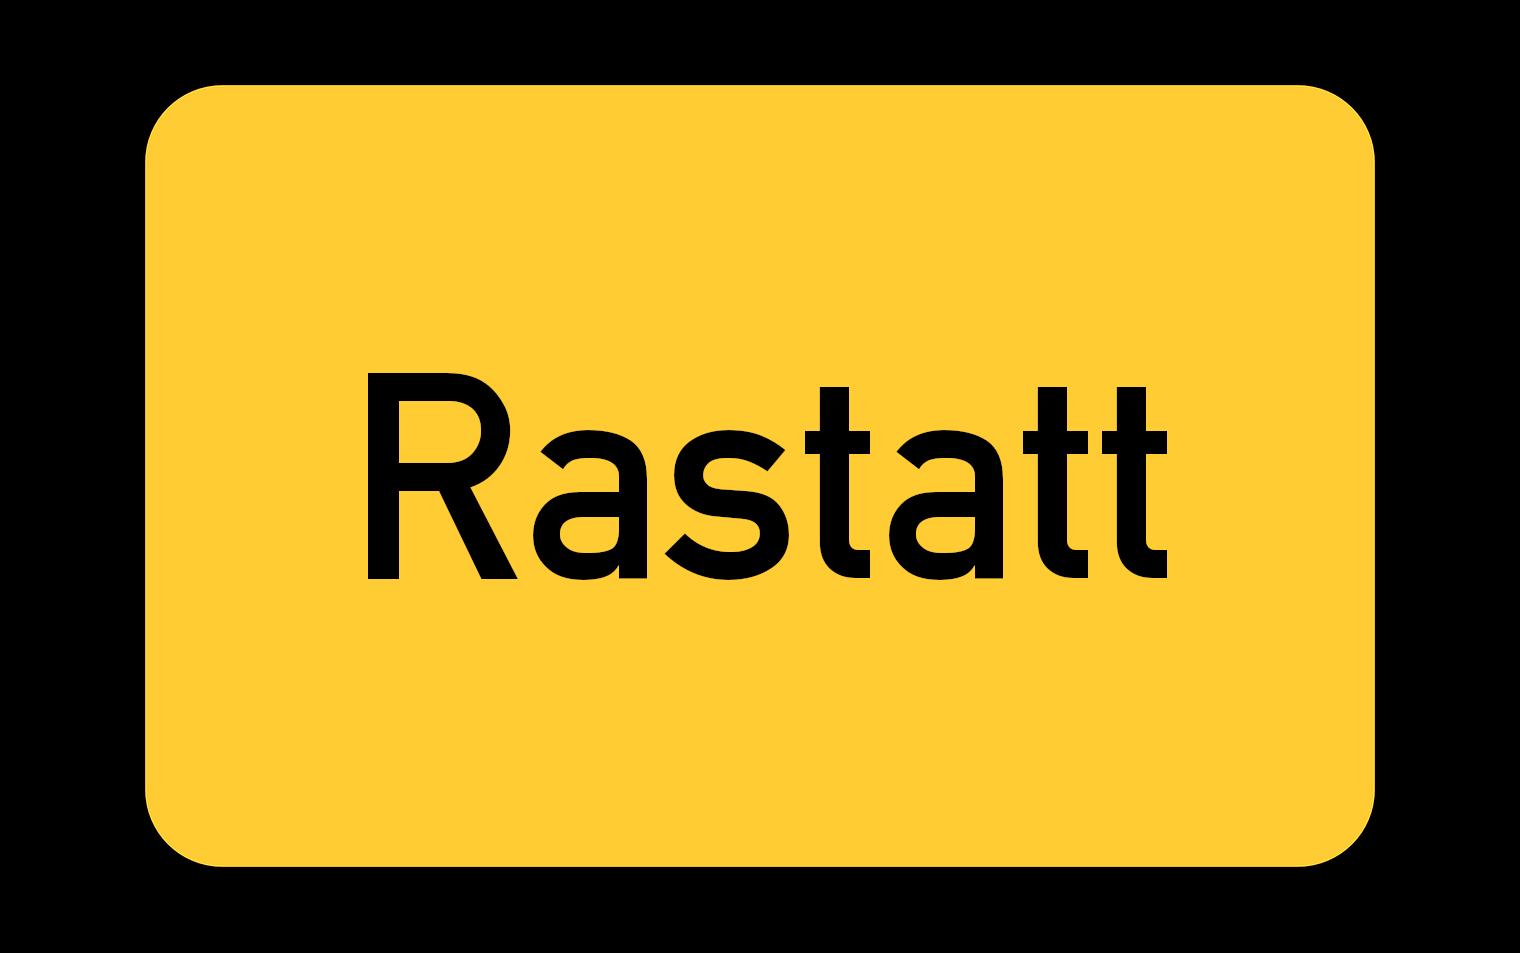 Isotox Schädlingsbekämpfung in Rastatt